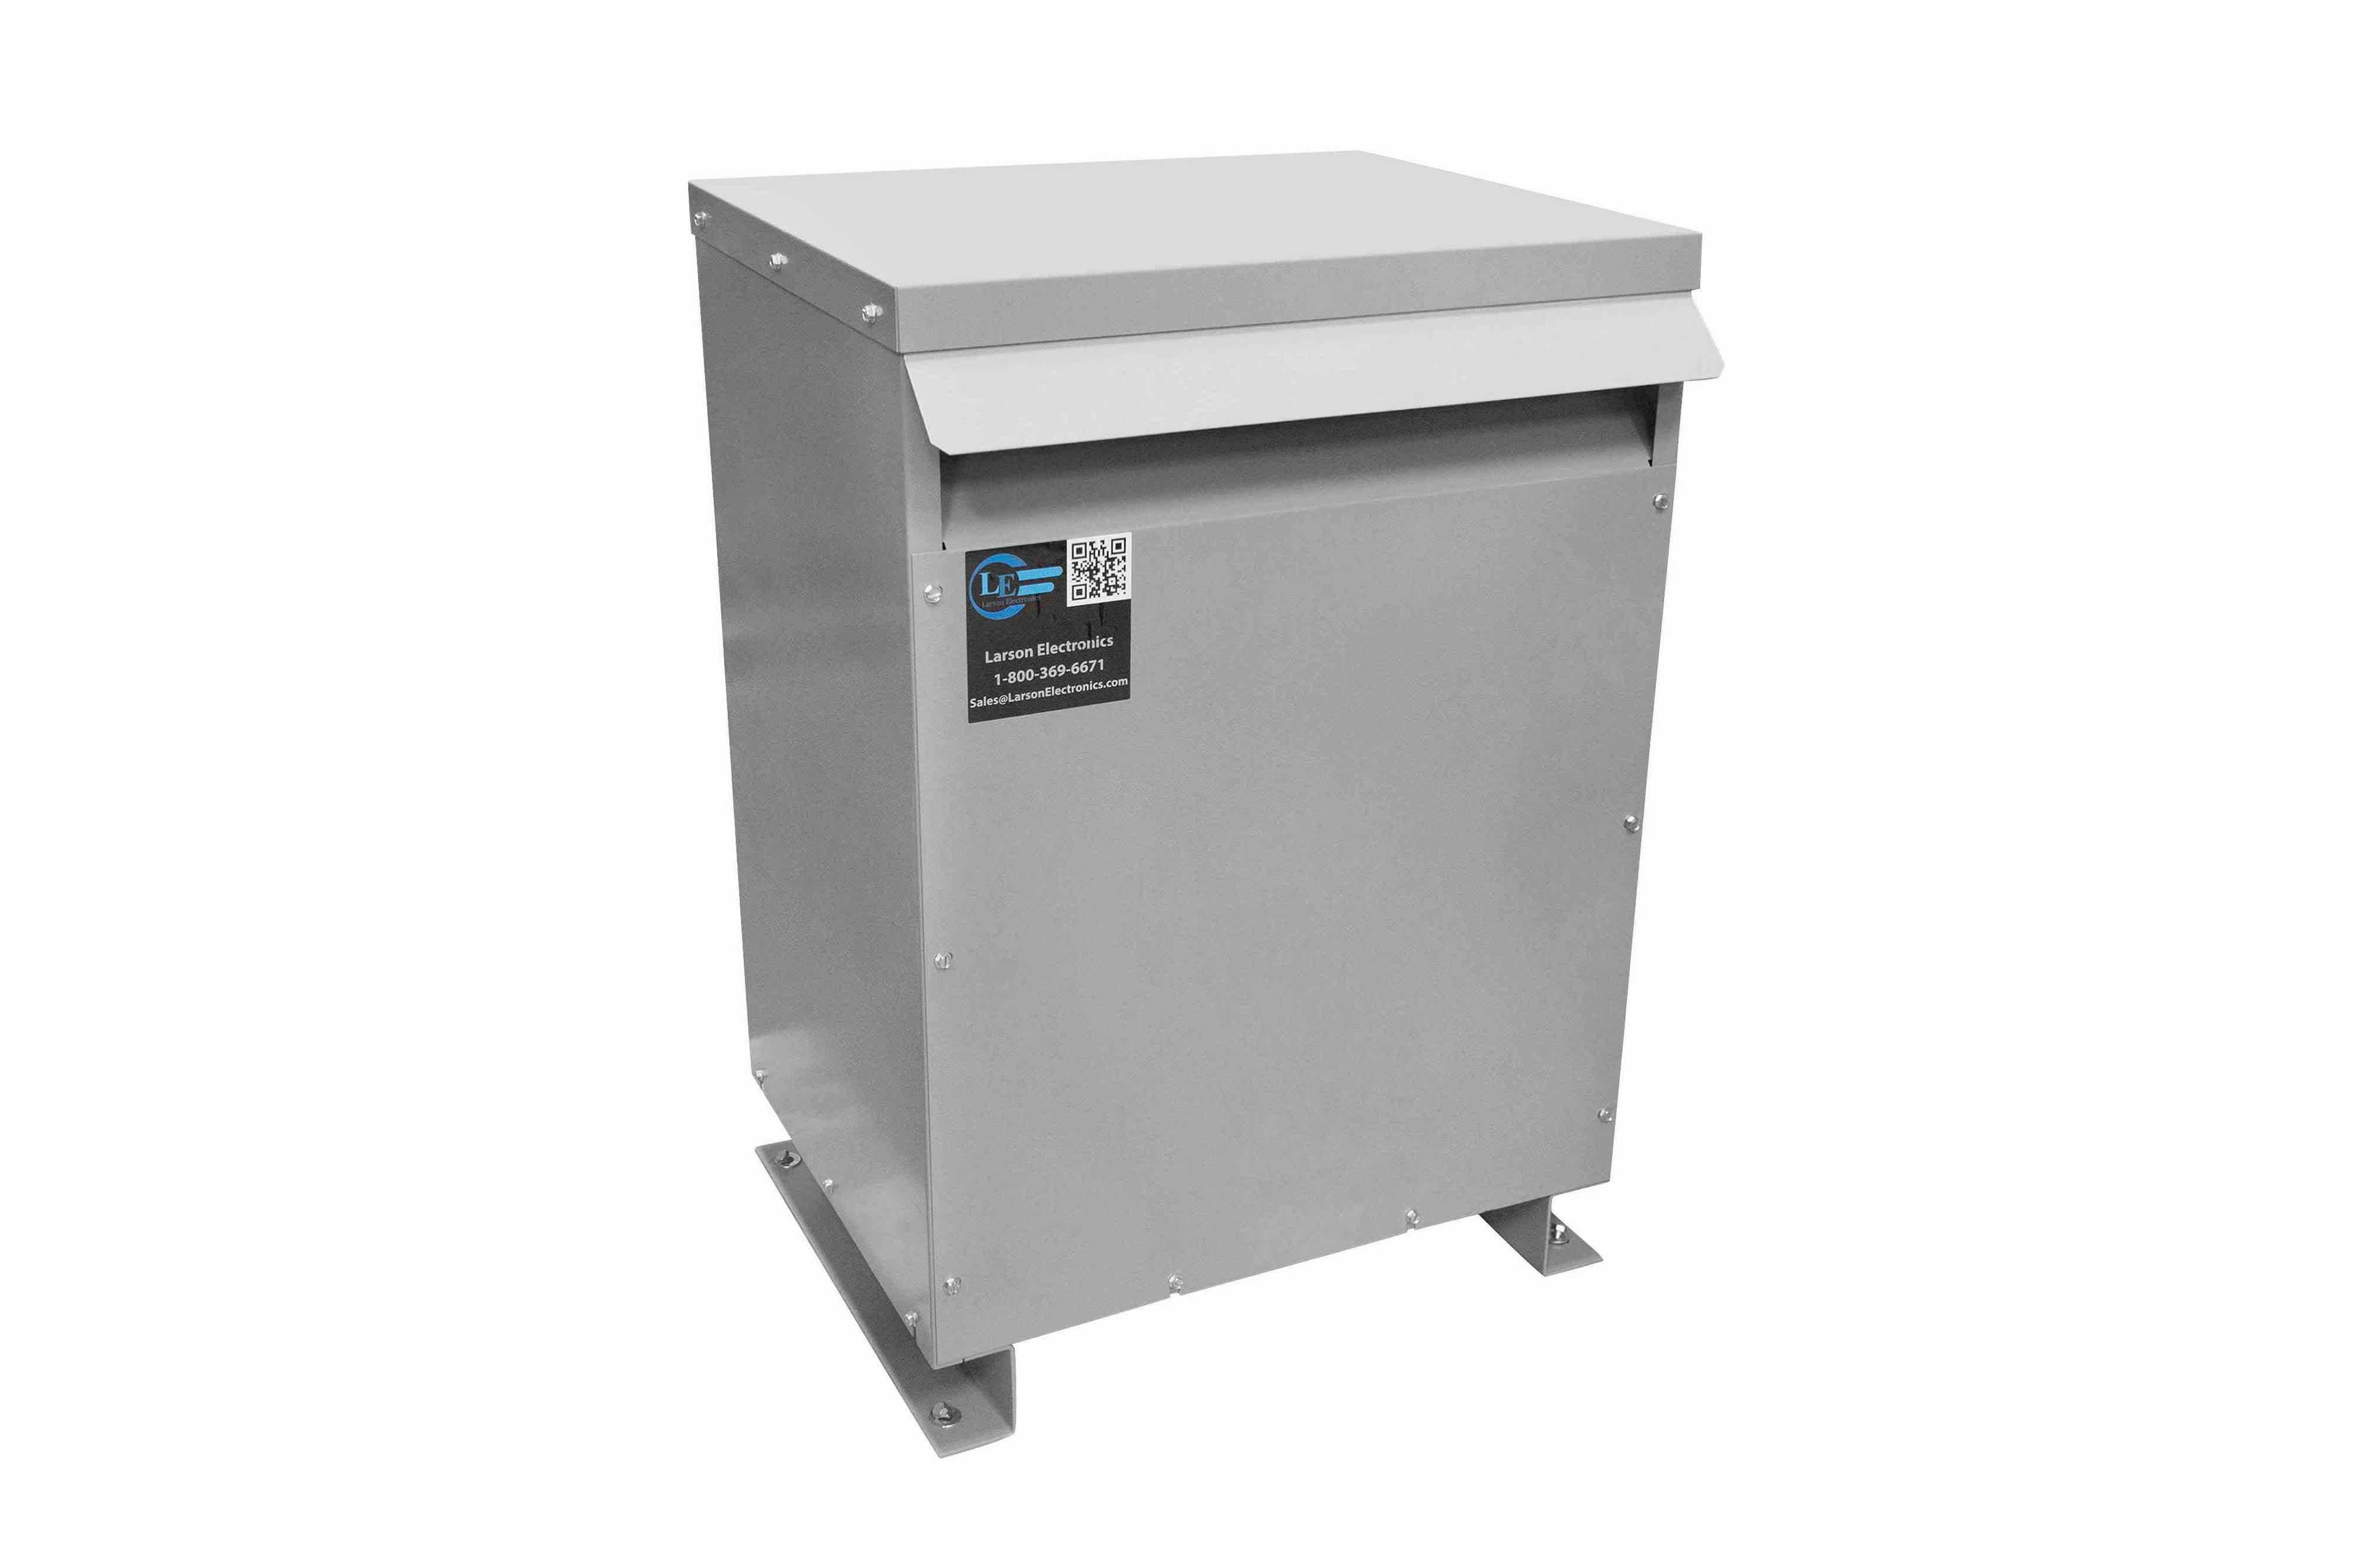 26 kVA 3PH Isolation Transformer, 230V Wye Primary, 480V Delta Secondary, N3R, Ventilated, 60 Hz